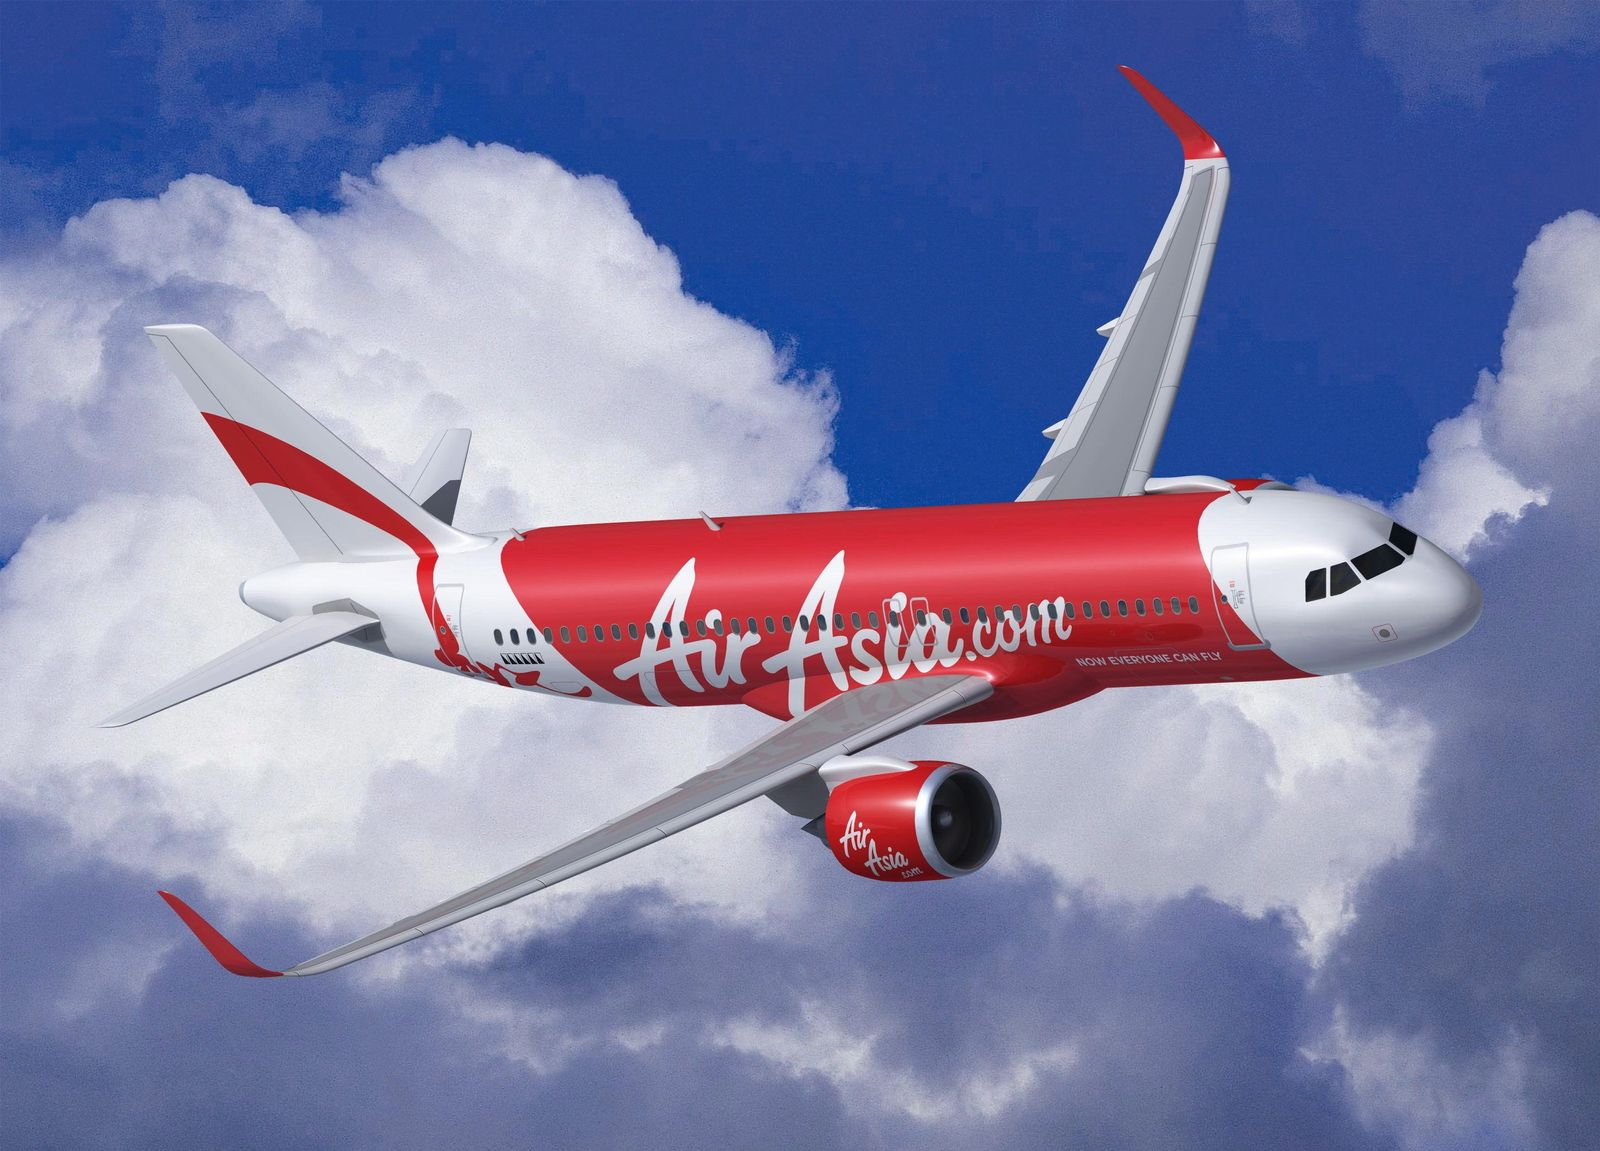 AirAsia orders 200 A320neo aircraft